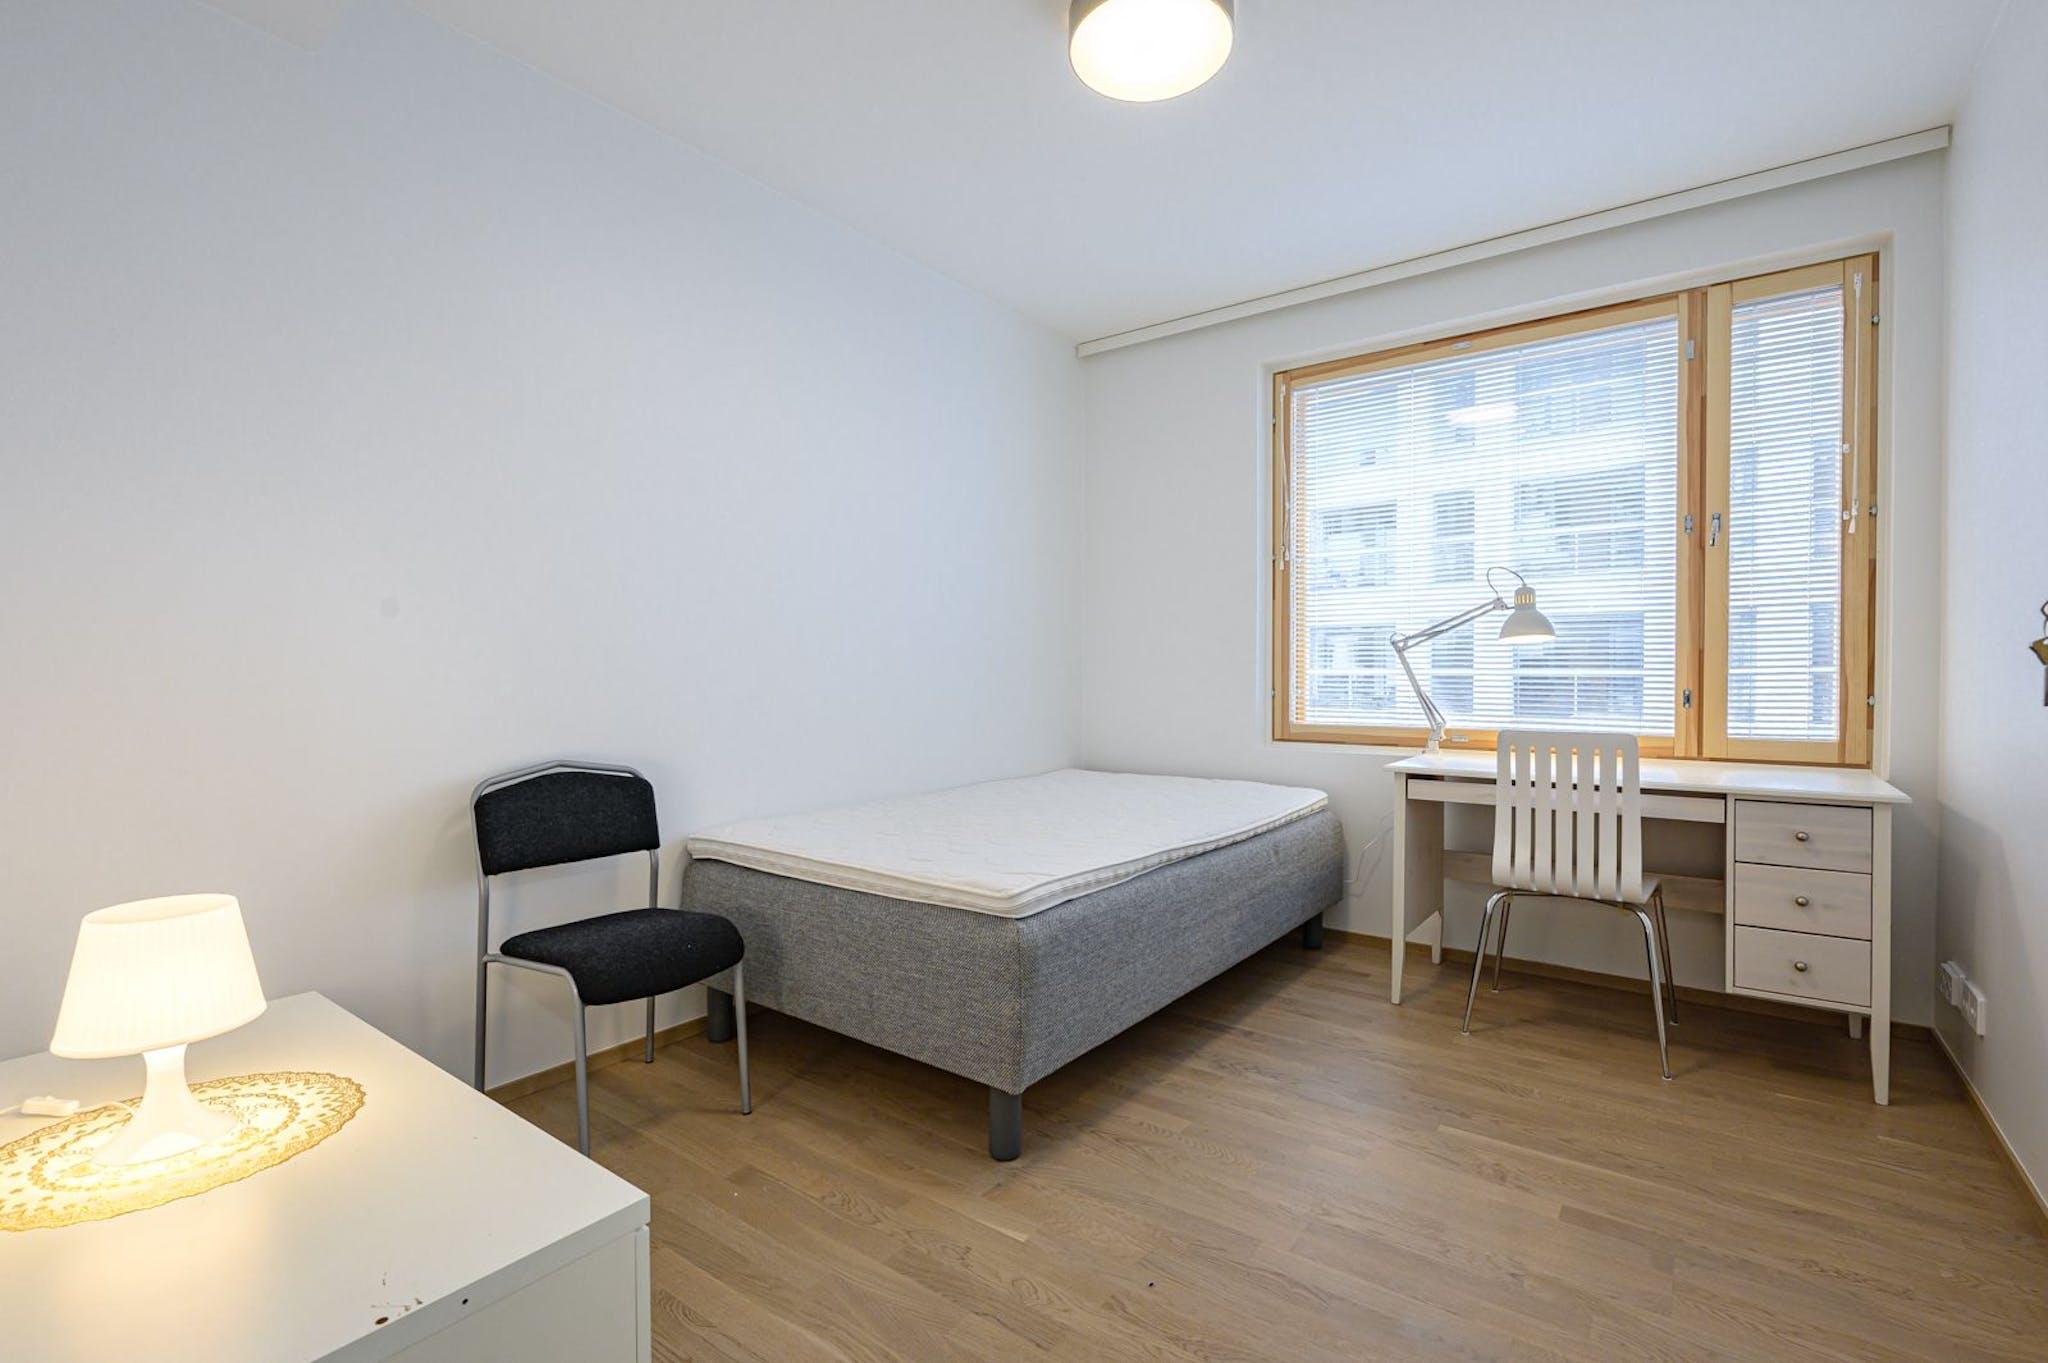 Holiday apartment Helsinki, Atlantinkatu, Holiday apartment for rent